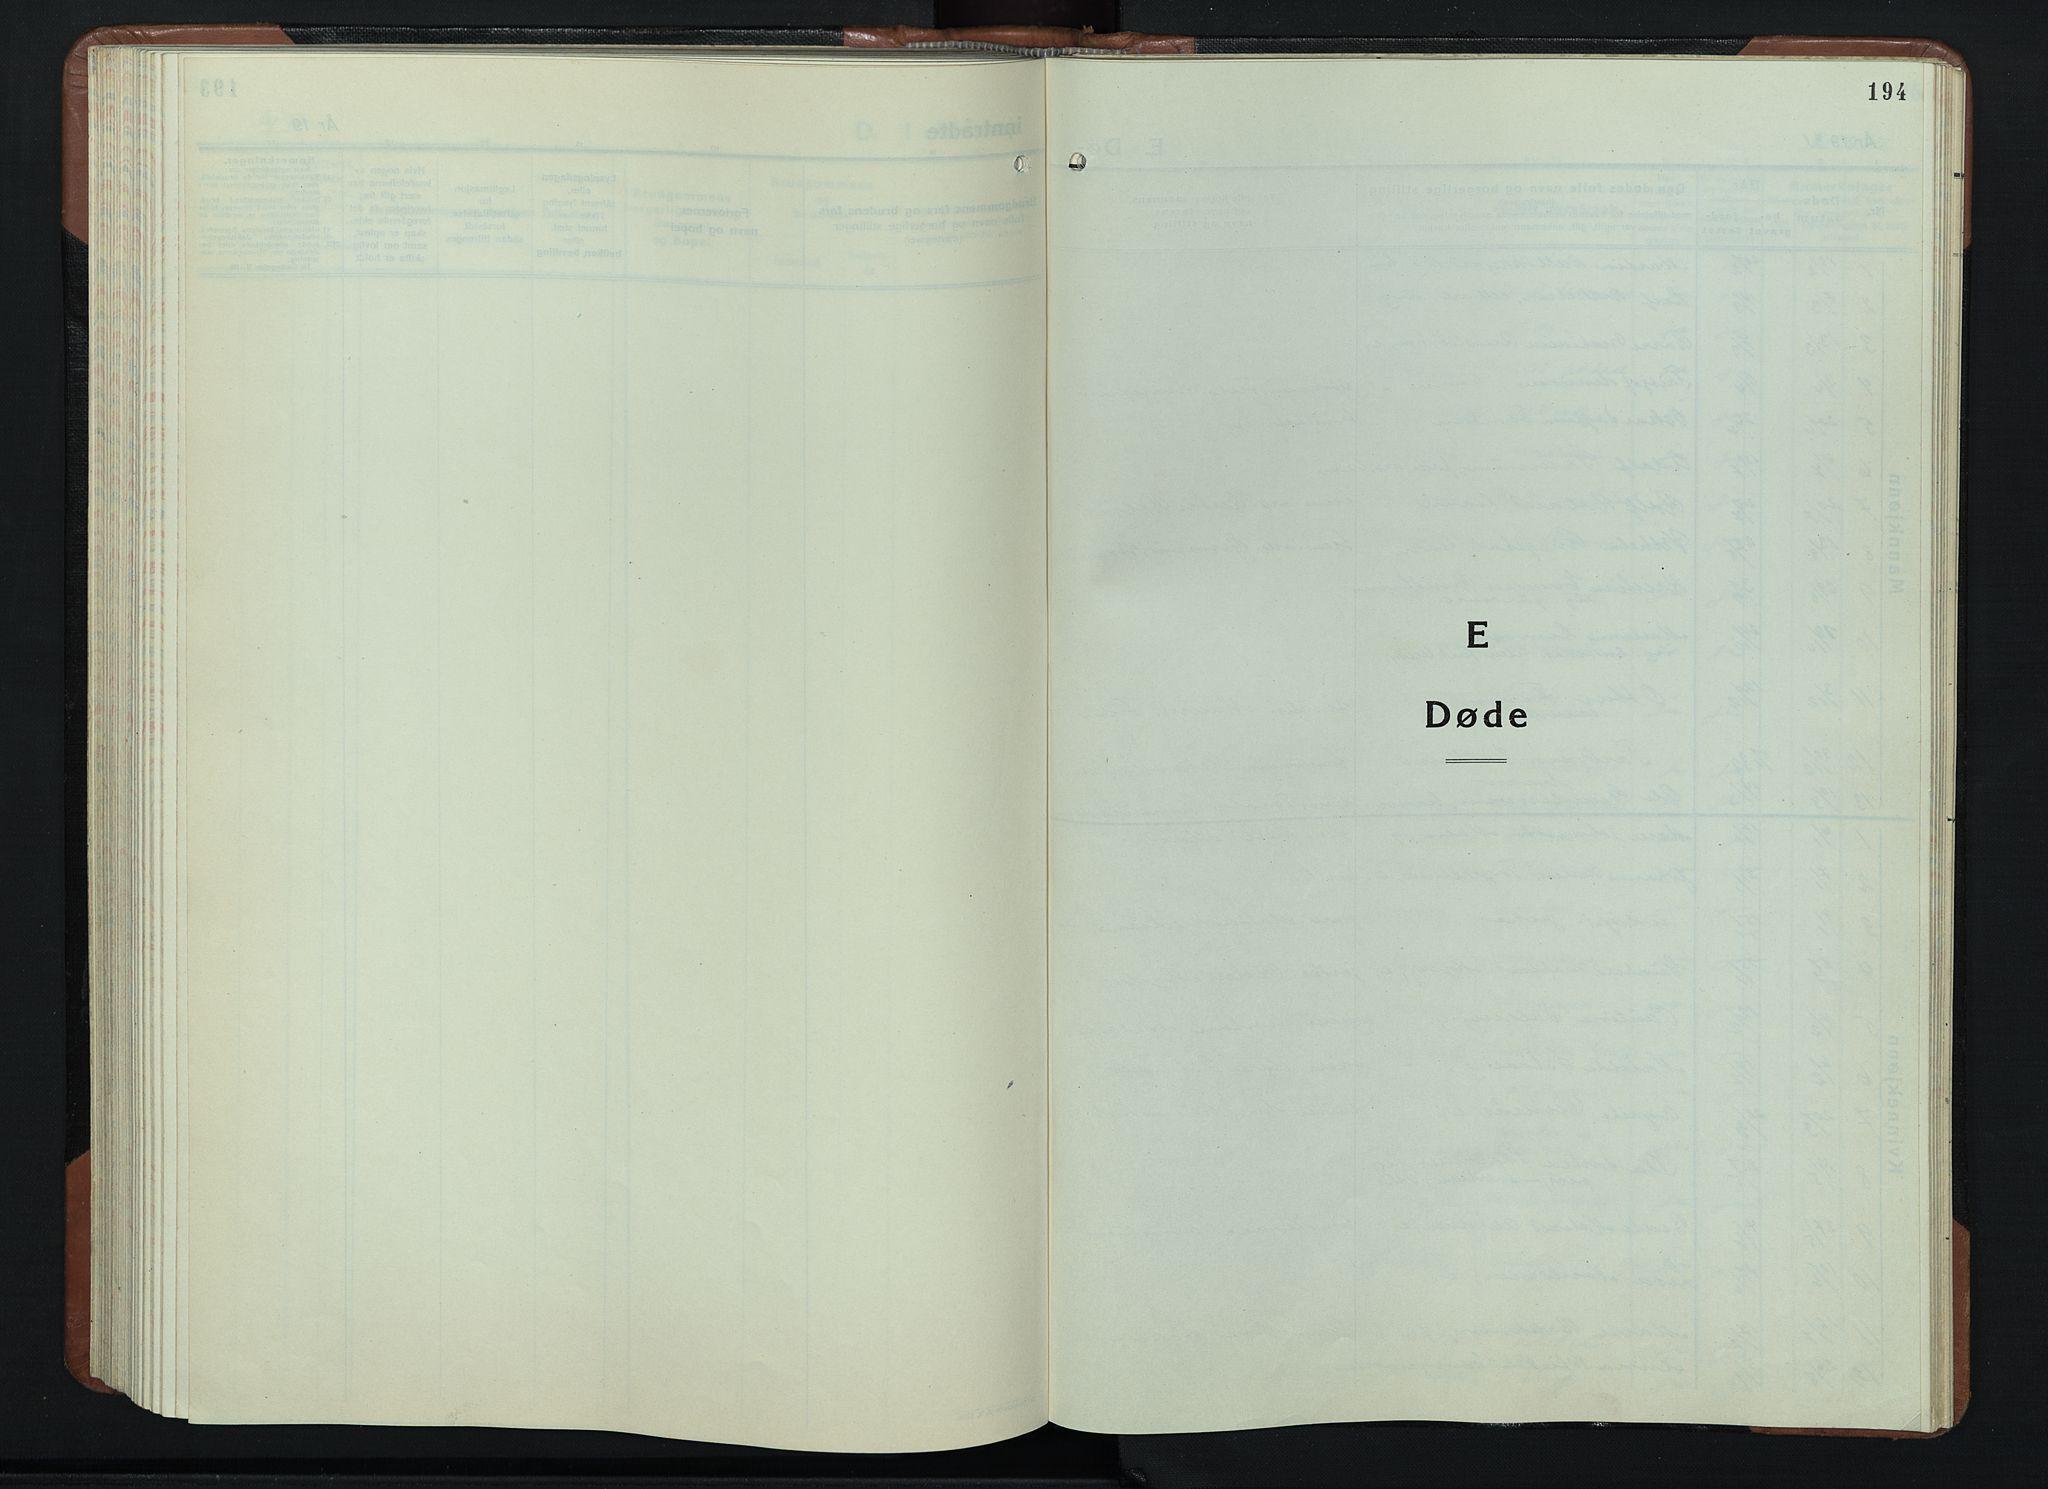 SAH, Vardal prestekontor, H/Ha/Hab/L0018: Klokkerbok nr. 18, 1931-1951, s. 194